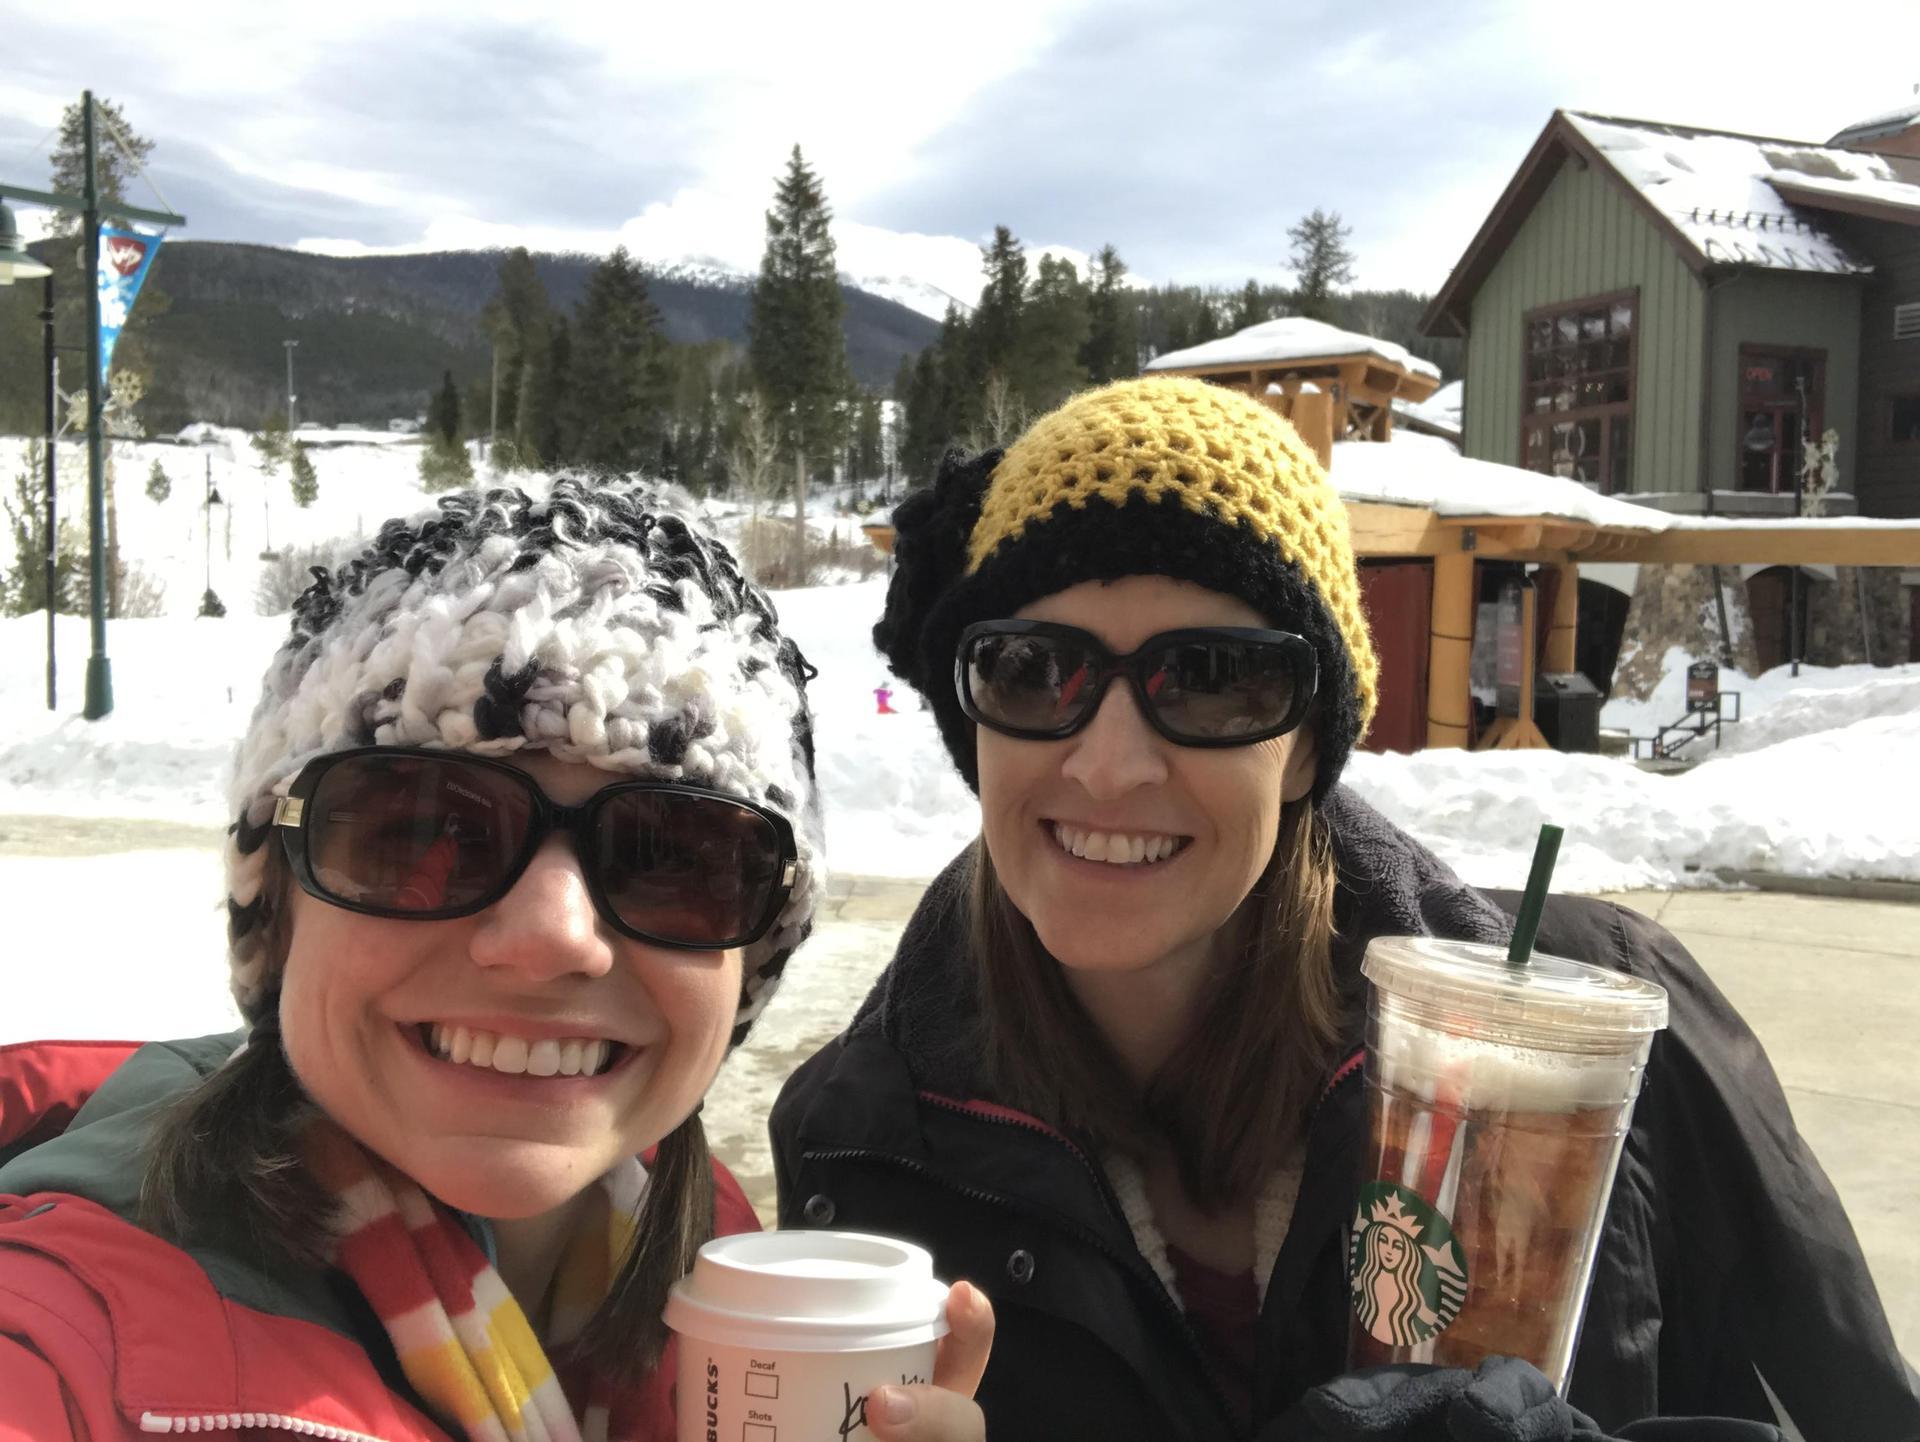 Starbucks with Ms. Cutshall